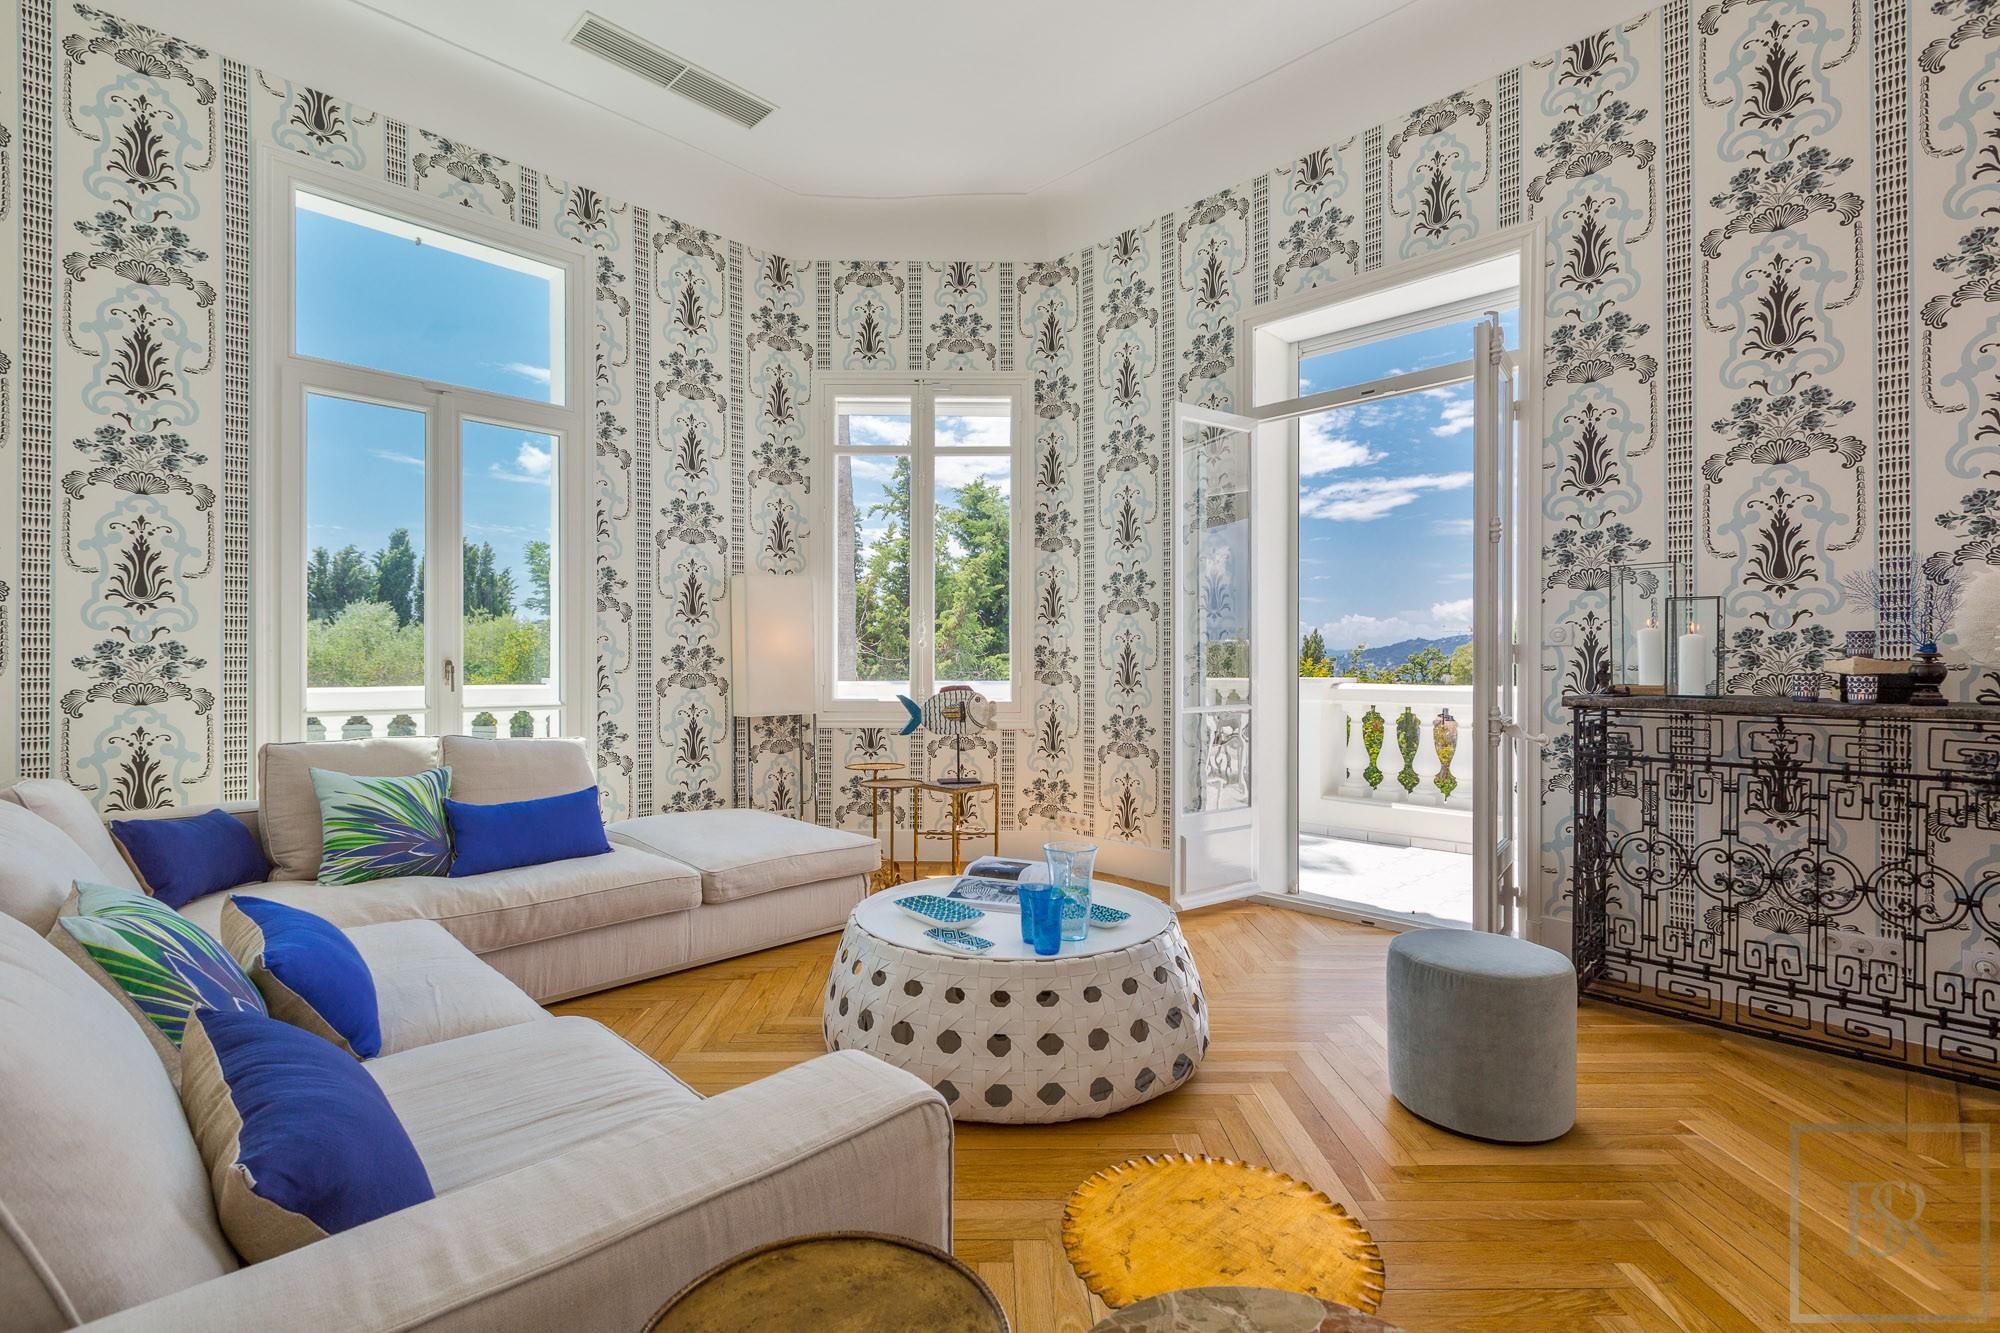 Villa Art Deco 6 BR - Cap d'Antibes, French Riviera rental For Super Rich